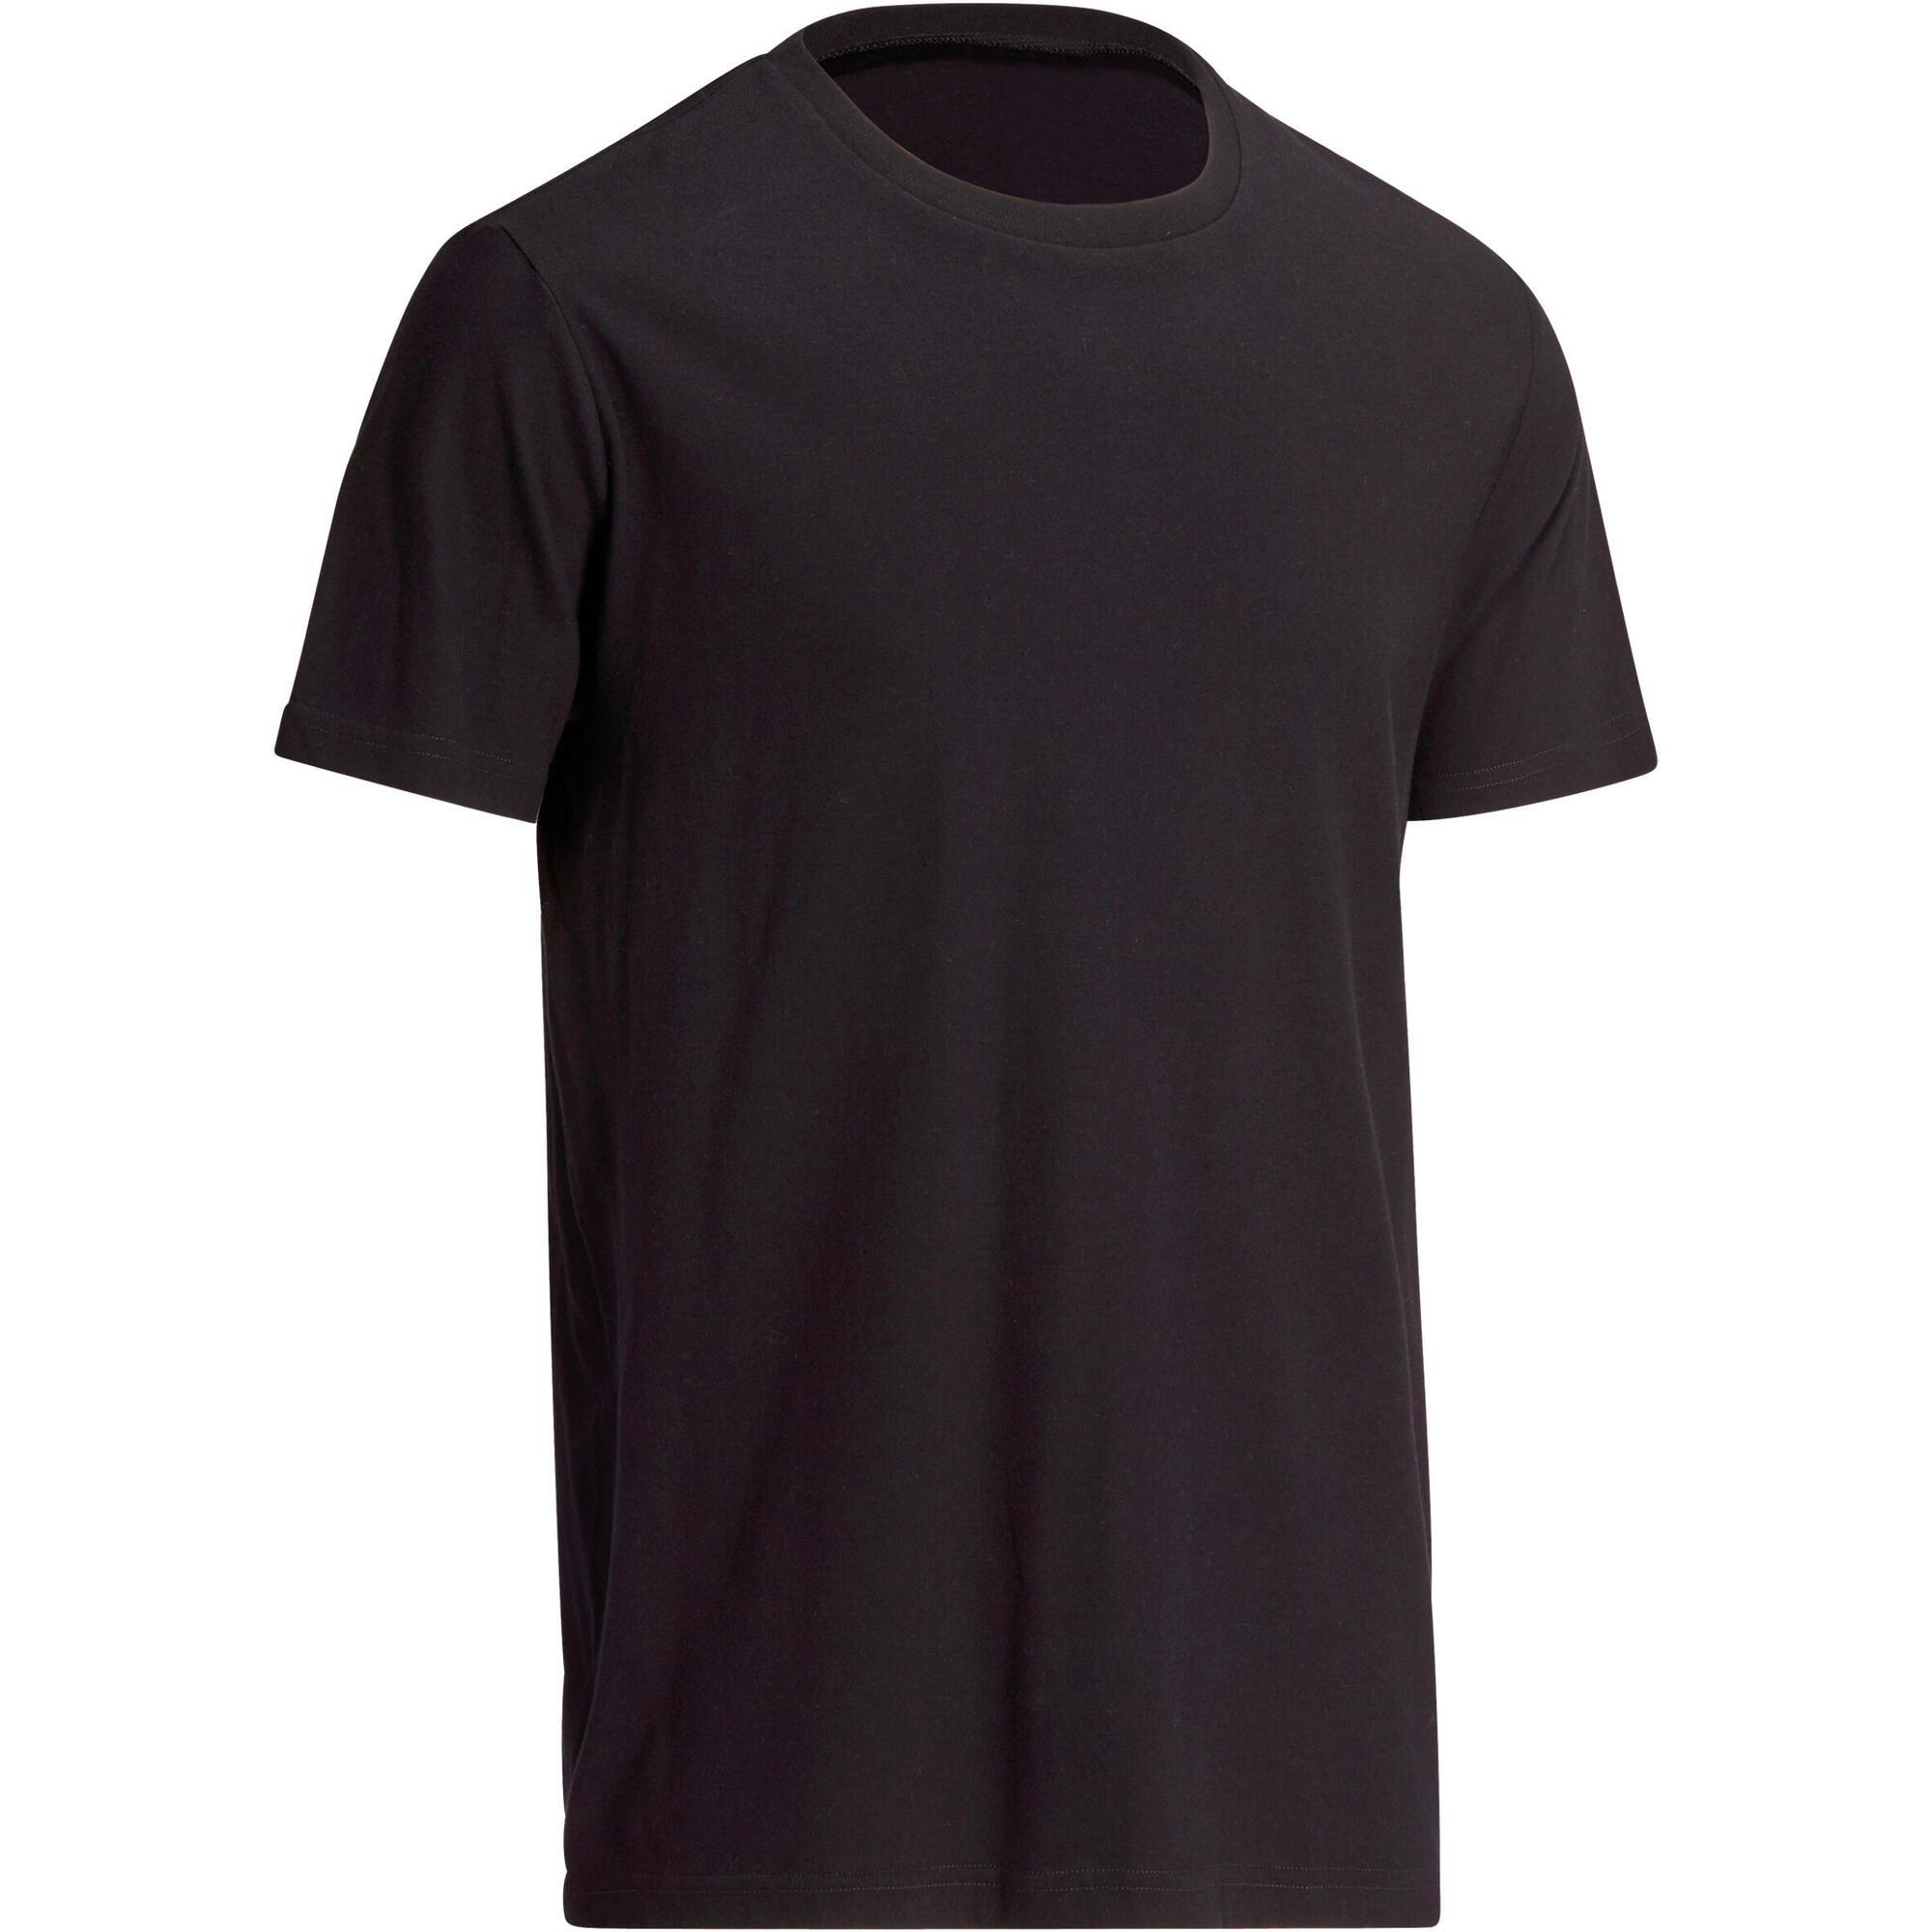 637c1c2a8 100 Sportee Regular-Fit 100% Cotton Gym Stretching T-Shirt - Black | Domyos  by Decathlon